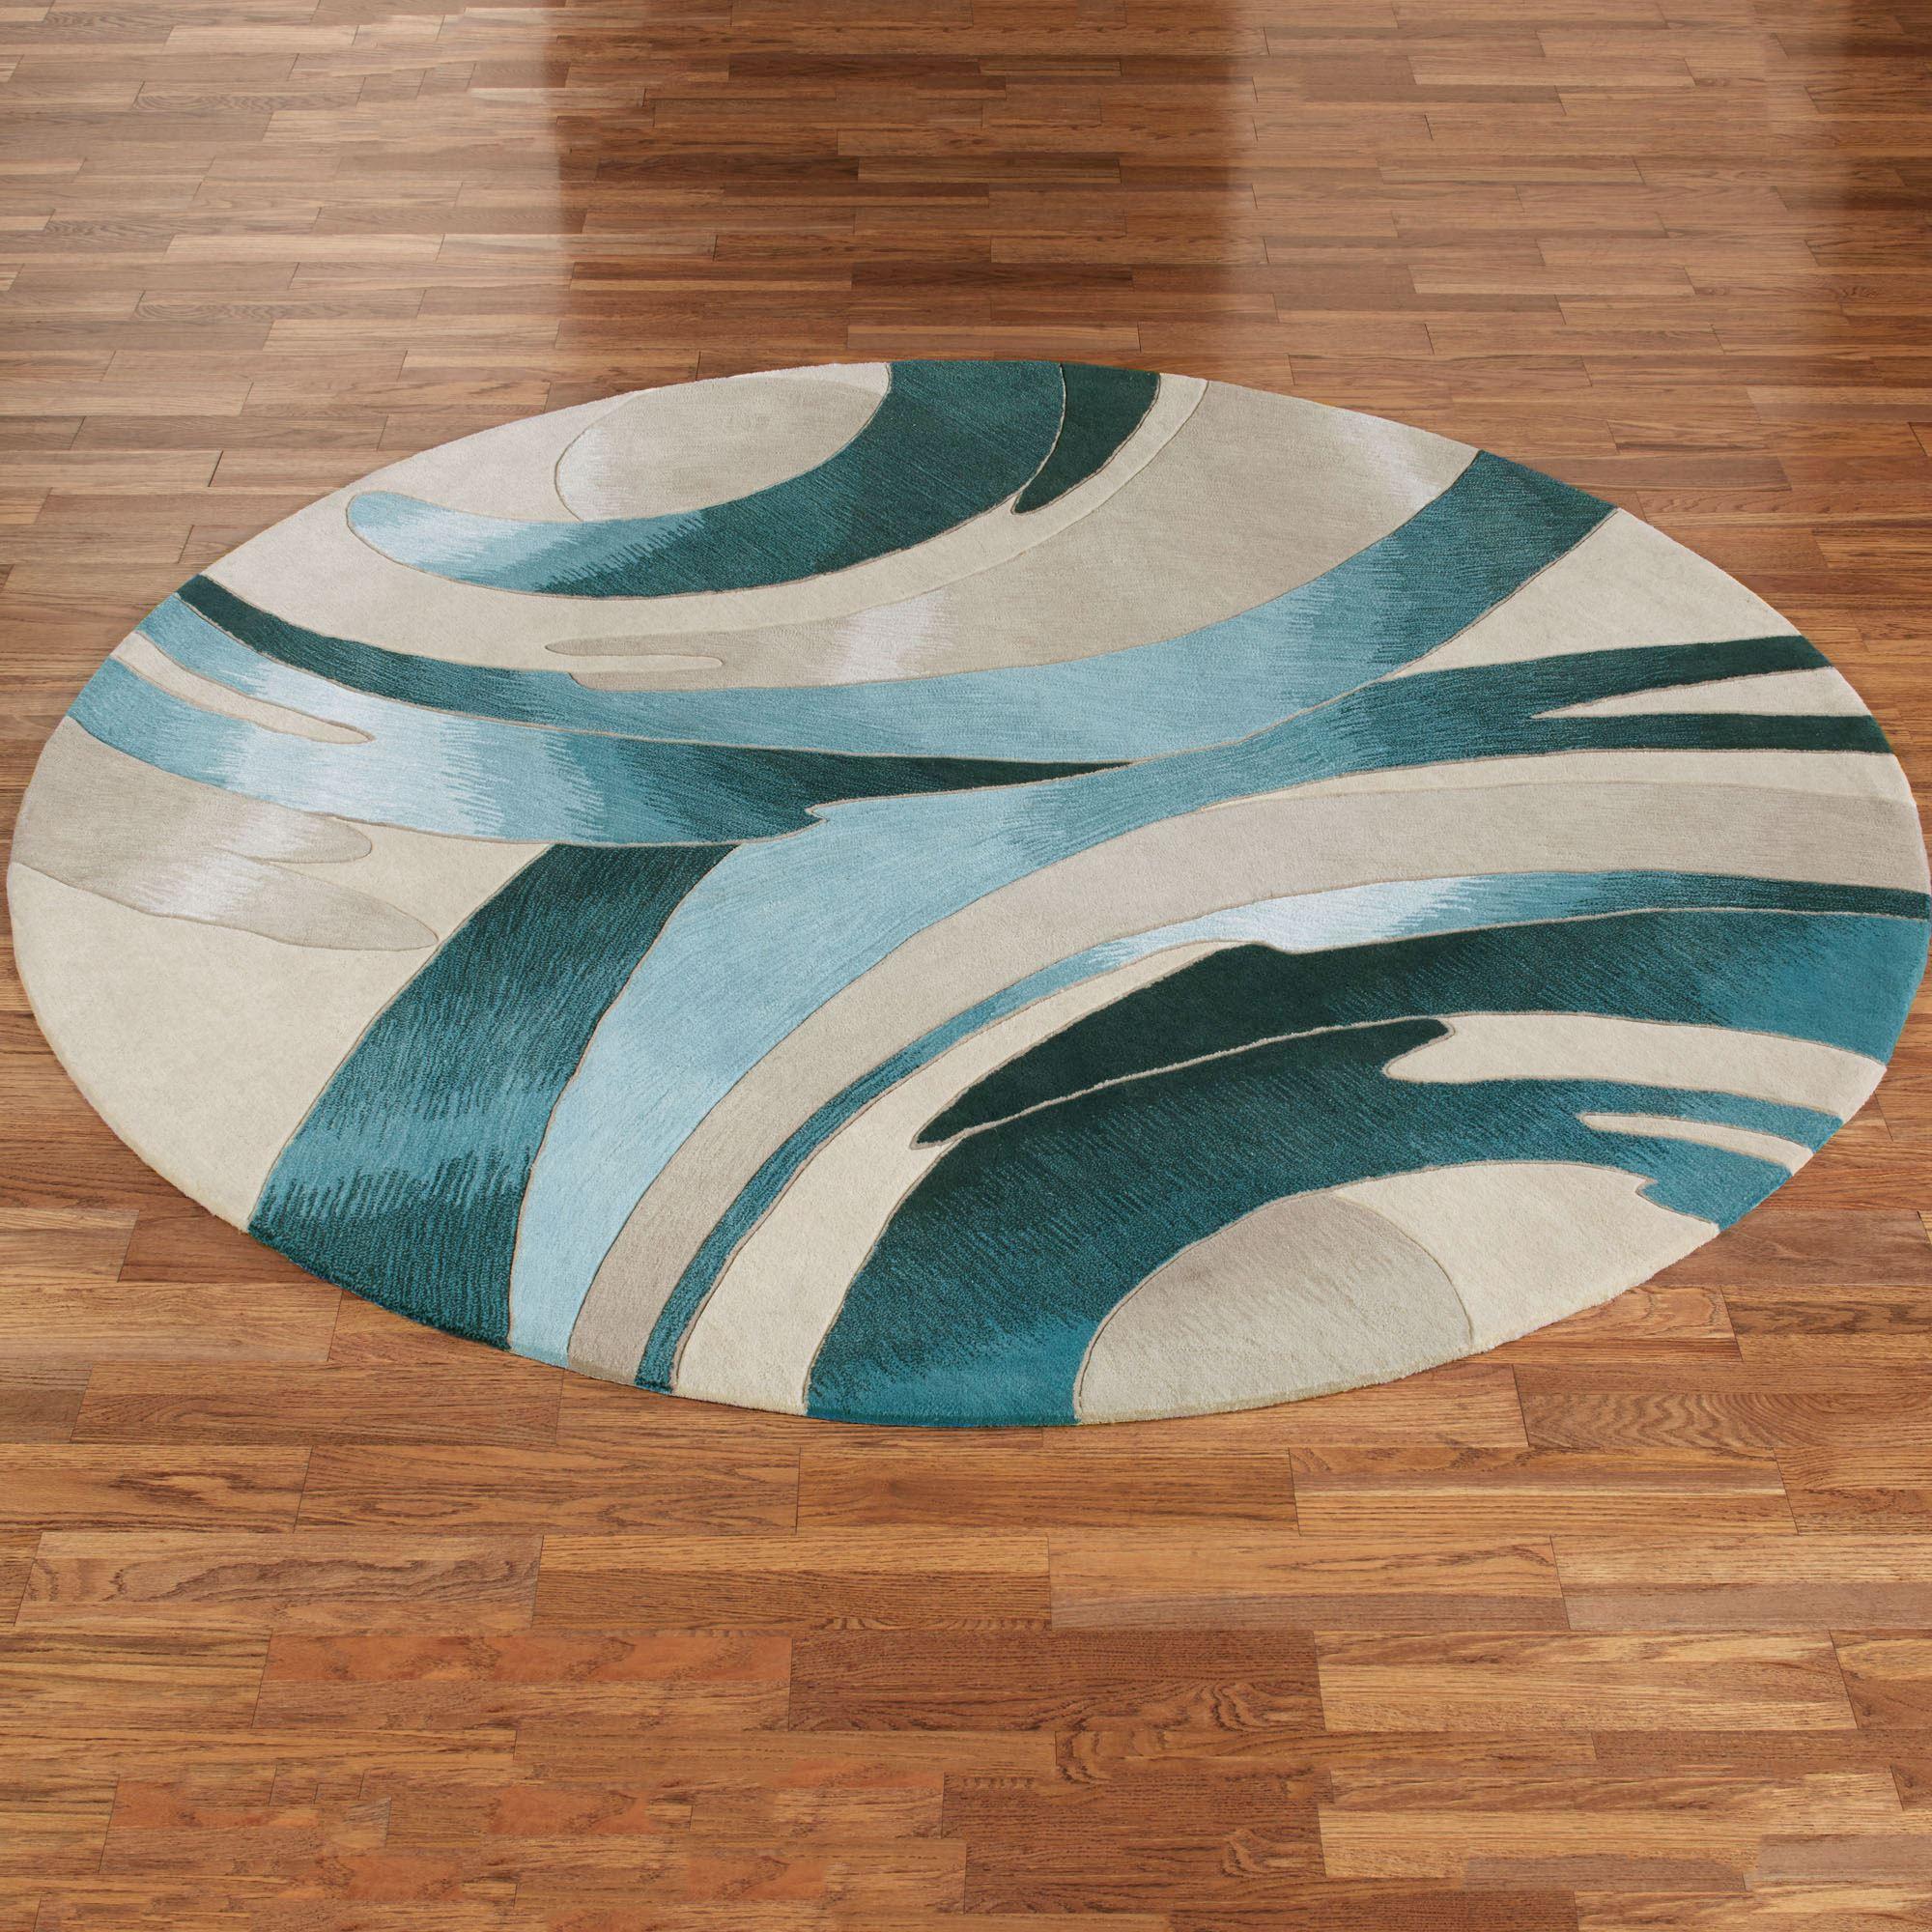 wonderful circular rugs perfect storm abstract round rugs by jasonw studios  jhlyfgd MSPORHE